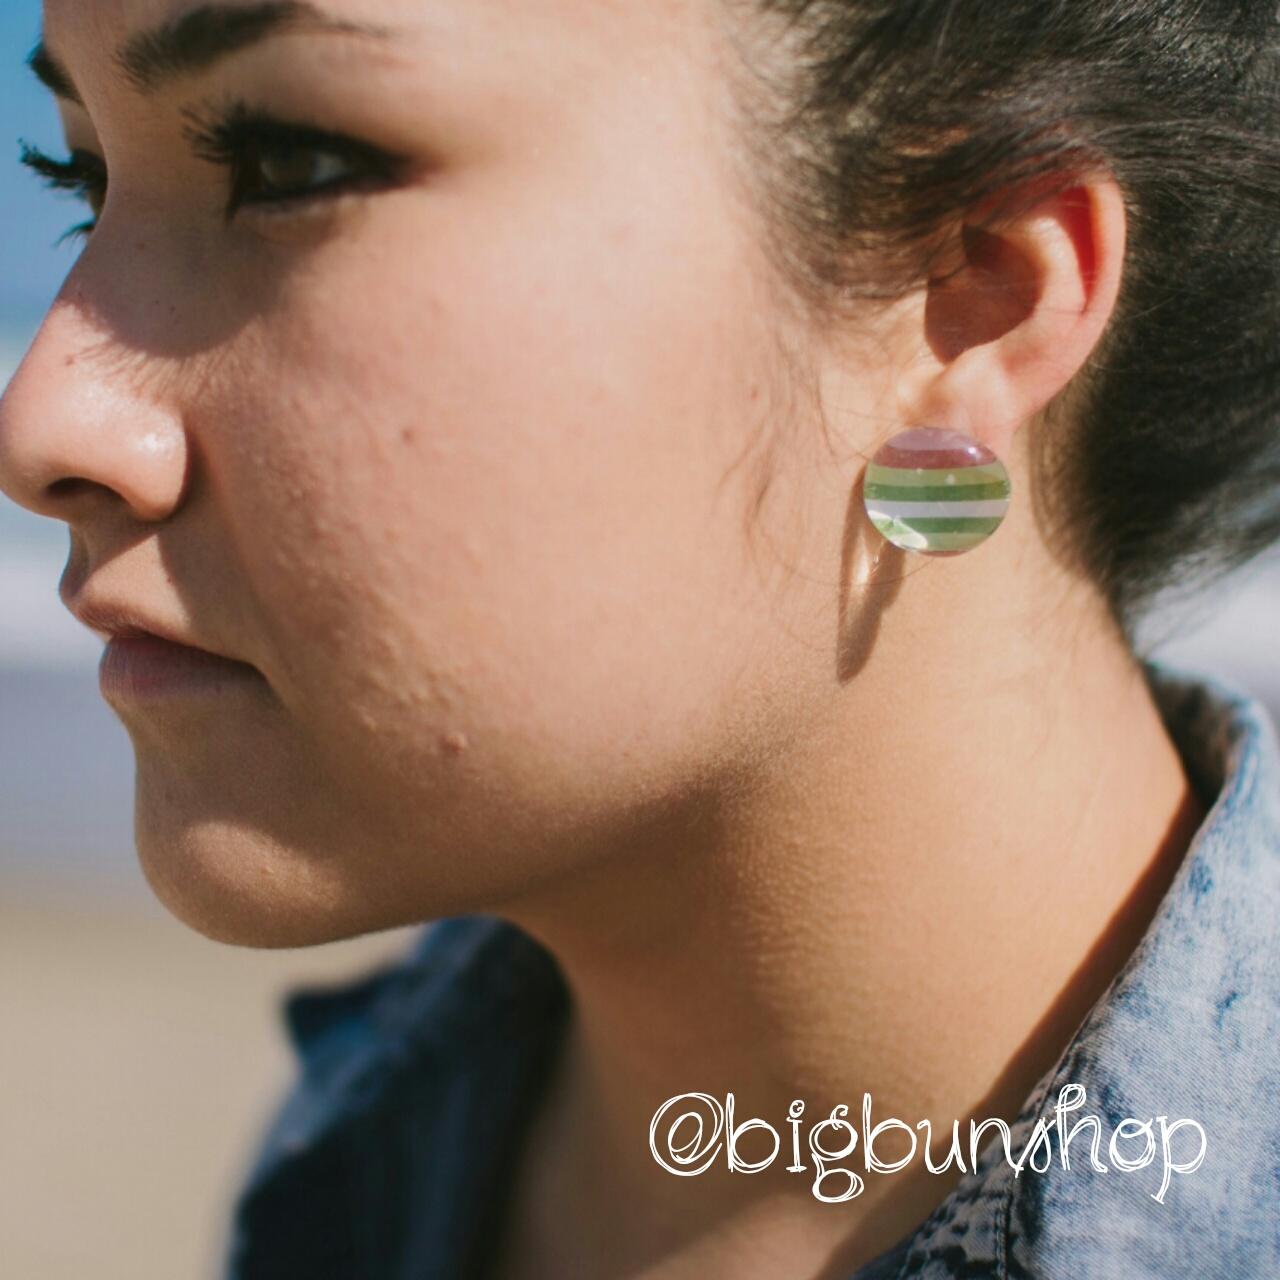 Round sherbet stripe earrings big bun shop online for Sparkles jewelry lakewood nj instagram